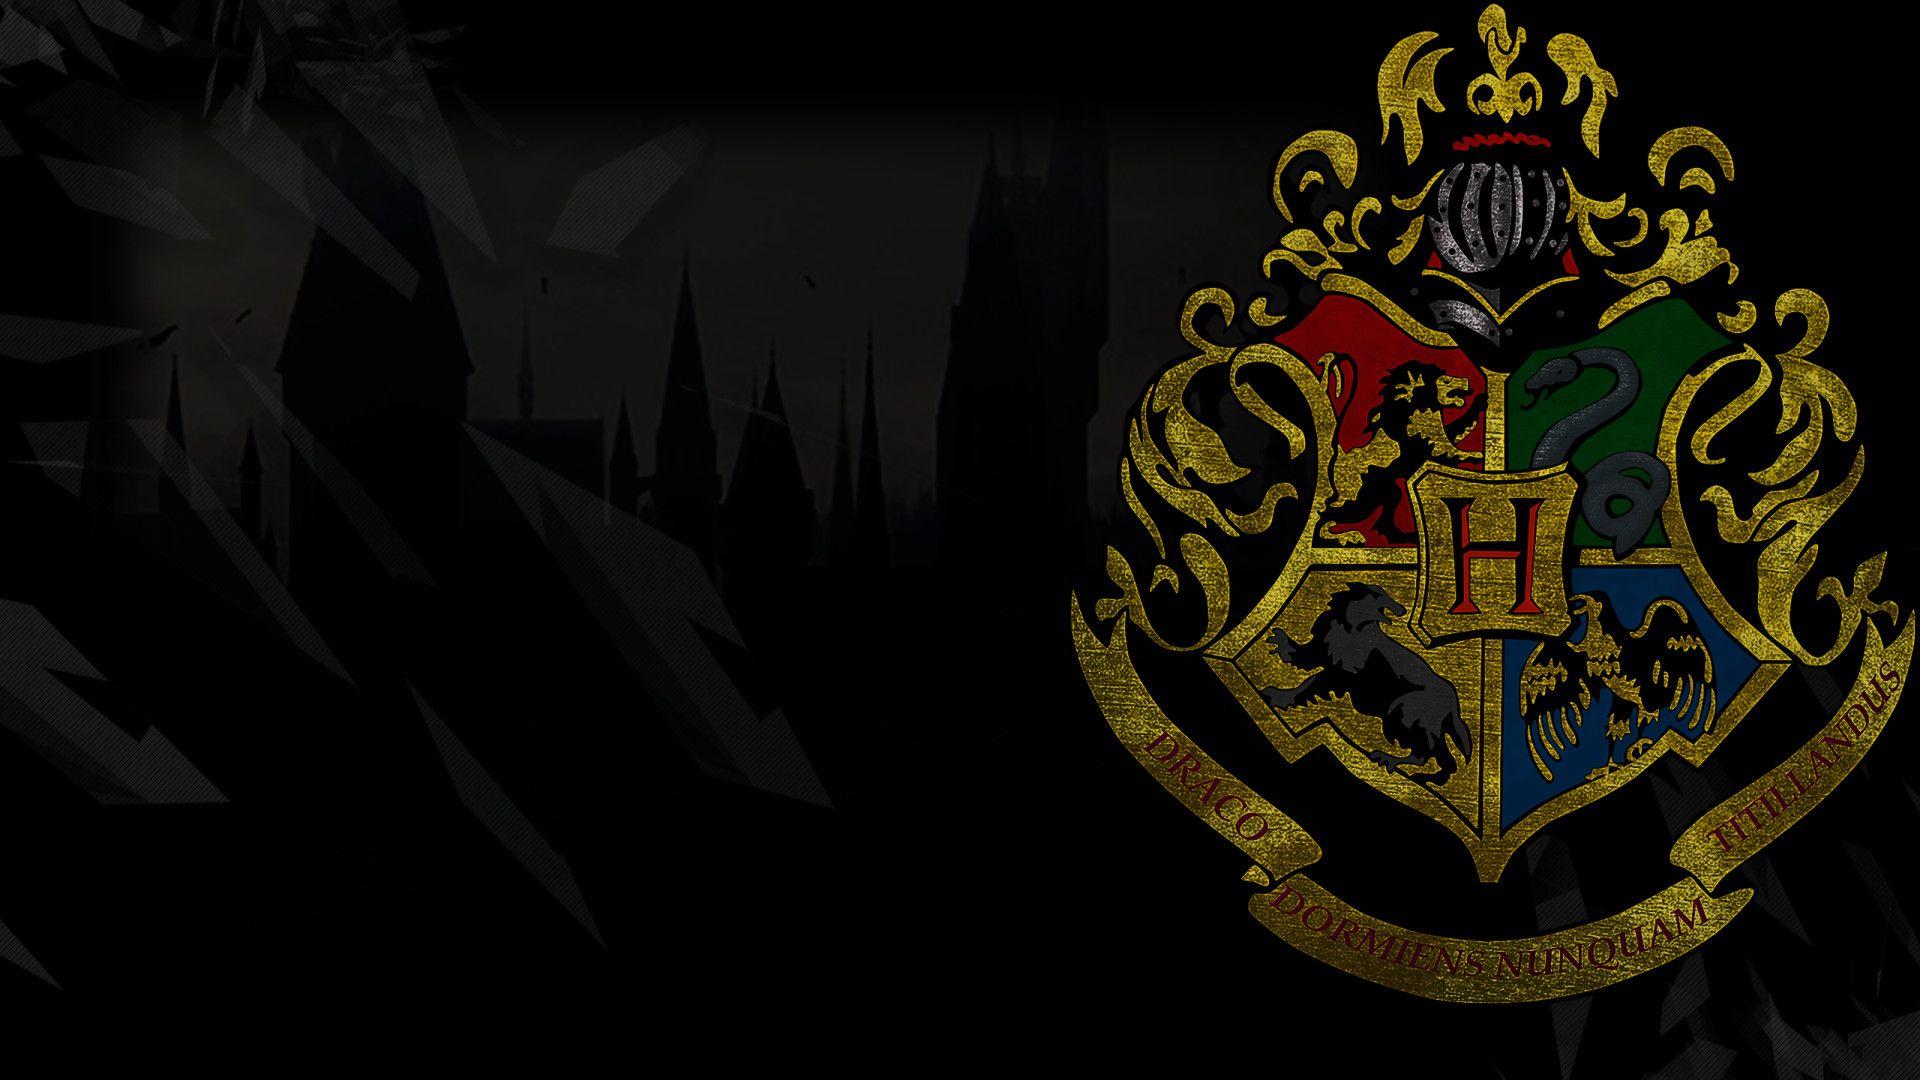 Best Harry Potter Gryffindor Wallpaper 1920x1080 Screen Harry Potter Wallpaper Harry Potter Background Slytherin Wallpaper